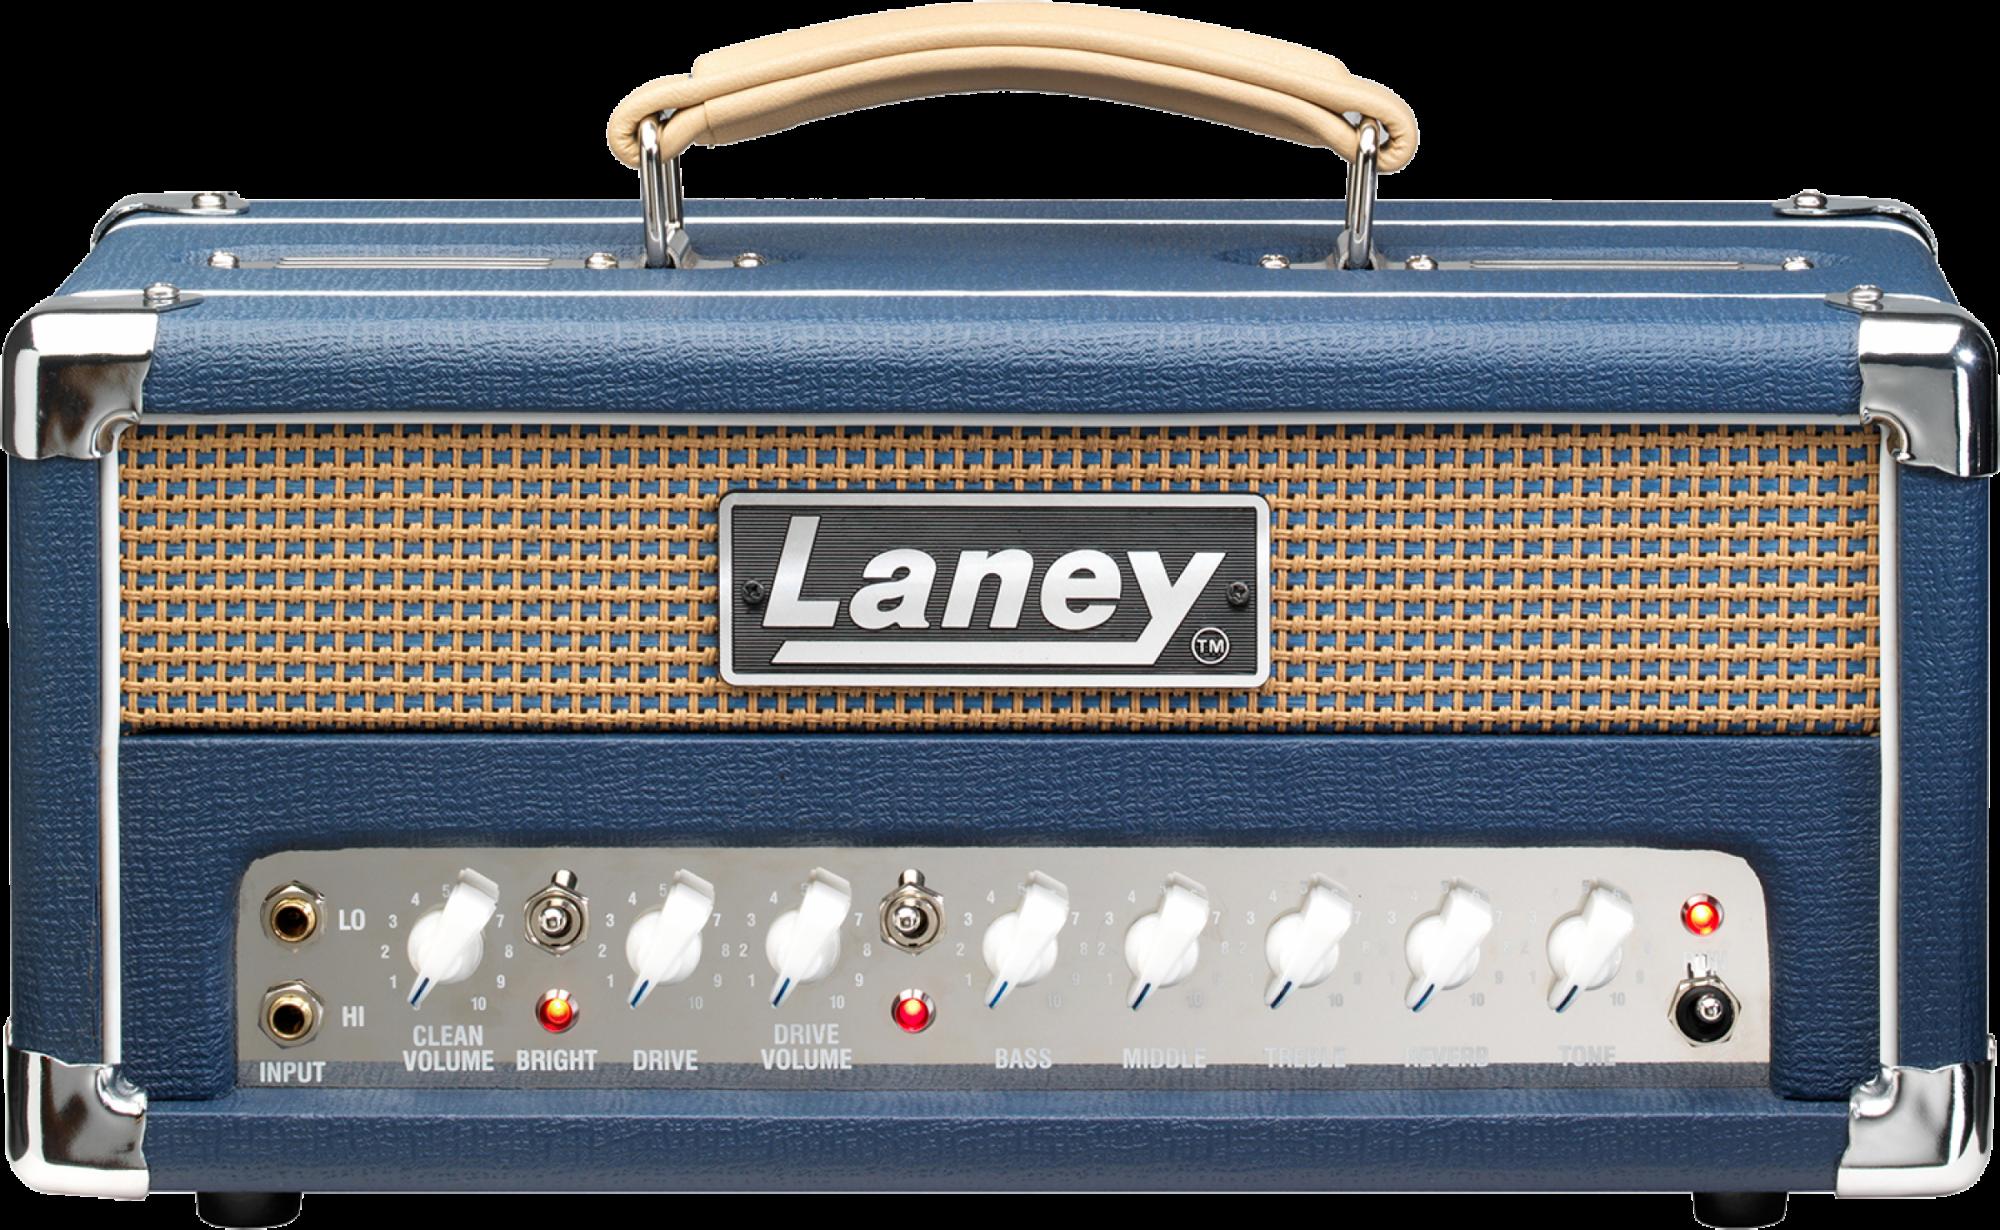 LANEY LIONHEART L5-STUDIO 2 CHANNEL TUBE GUITAR AMPLIFIER HEAD CLASS A , 5W, USB